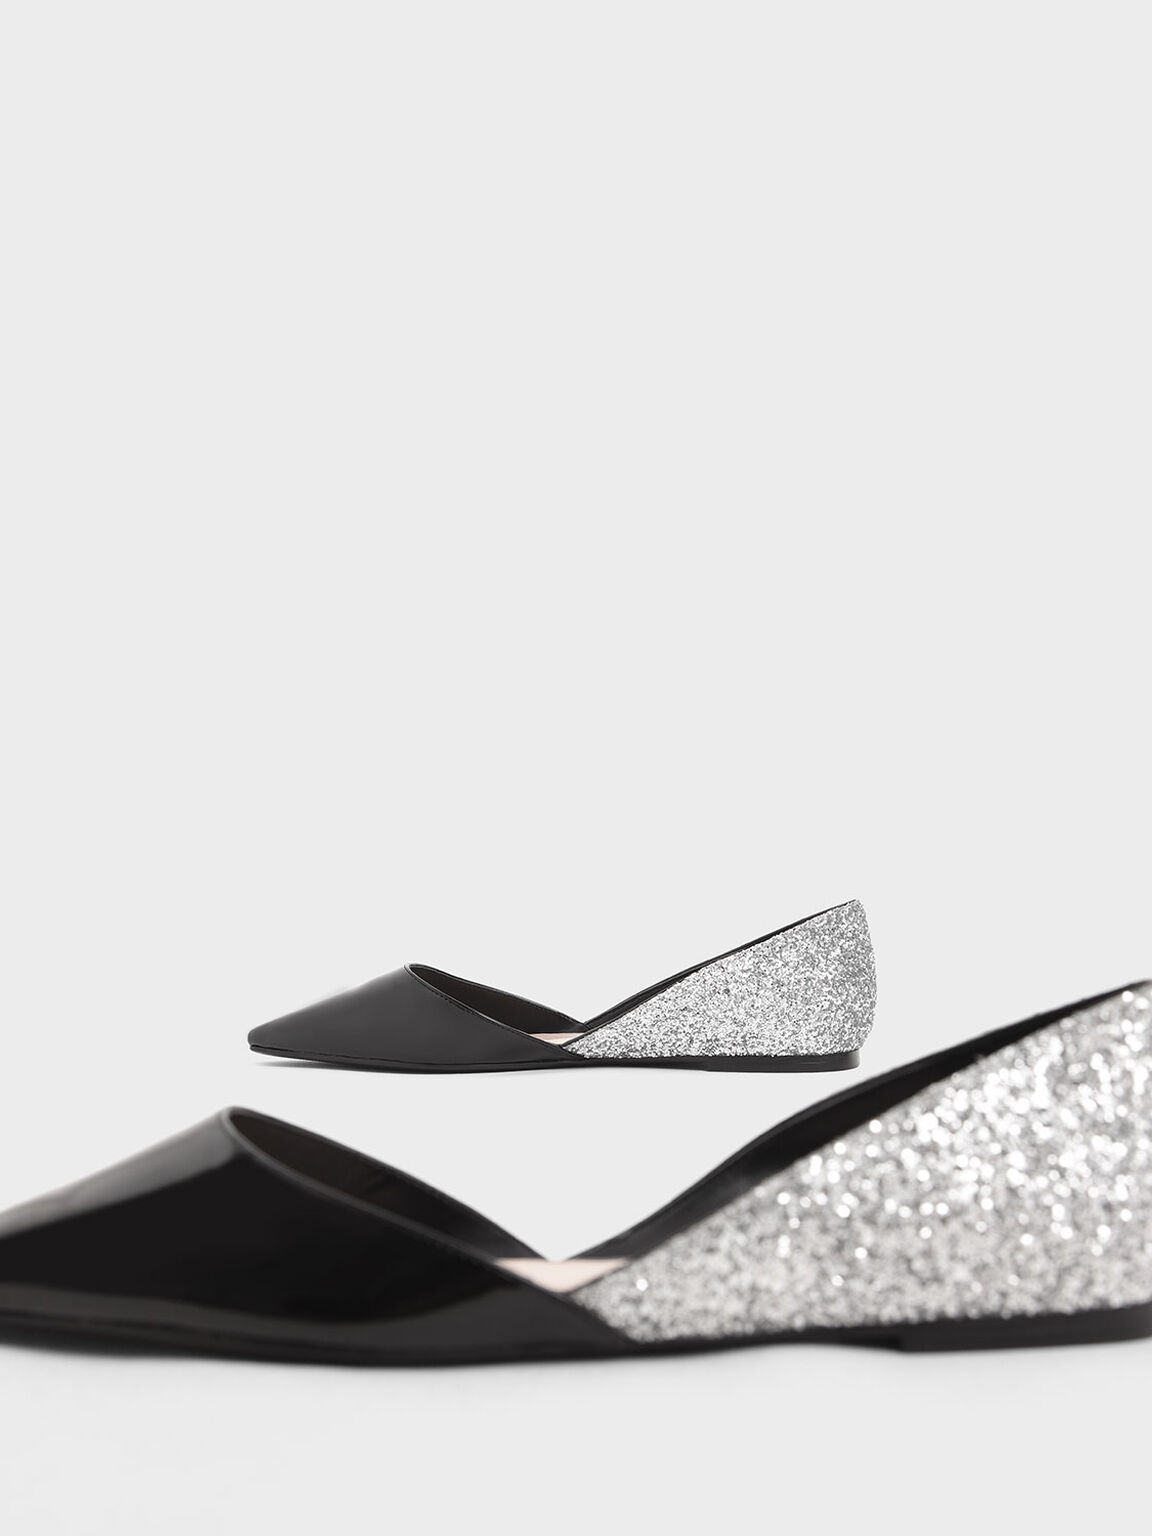 Two-Tone Patent Glitter D'Orsay Flats, Multi, hi-res